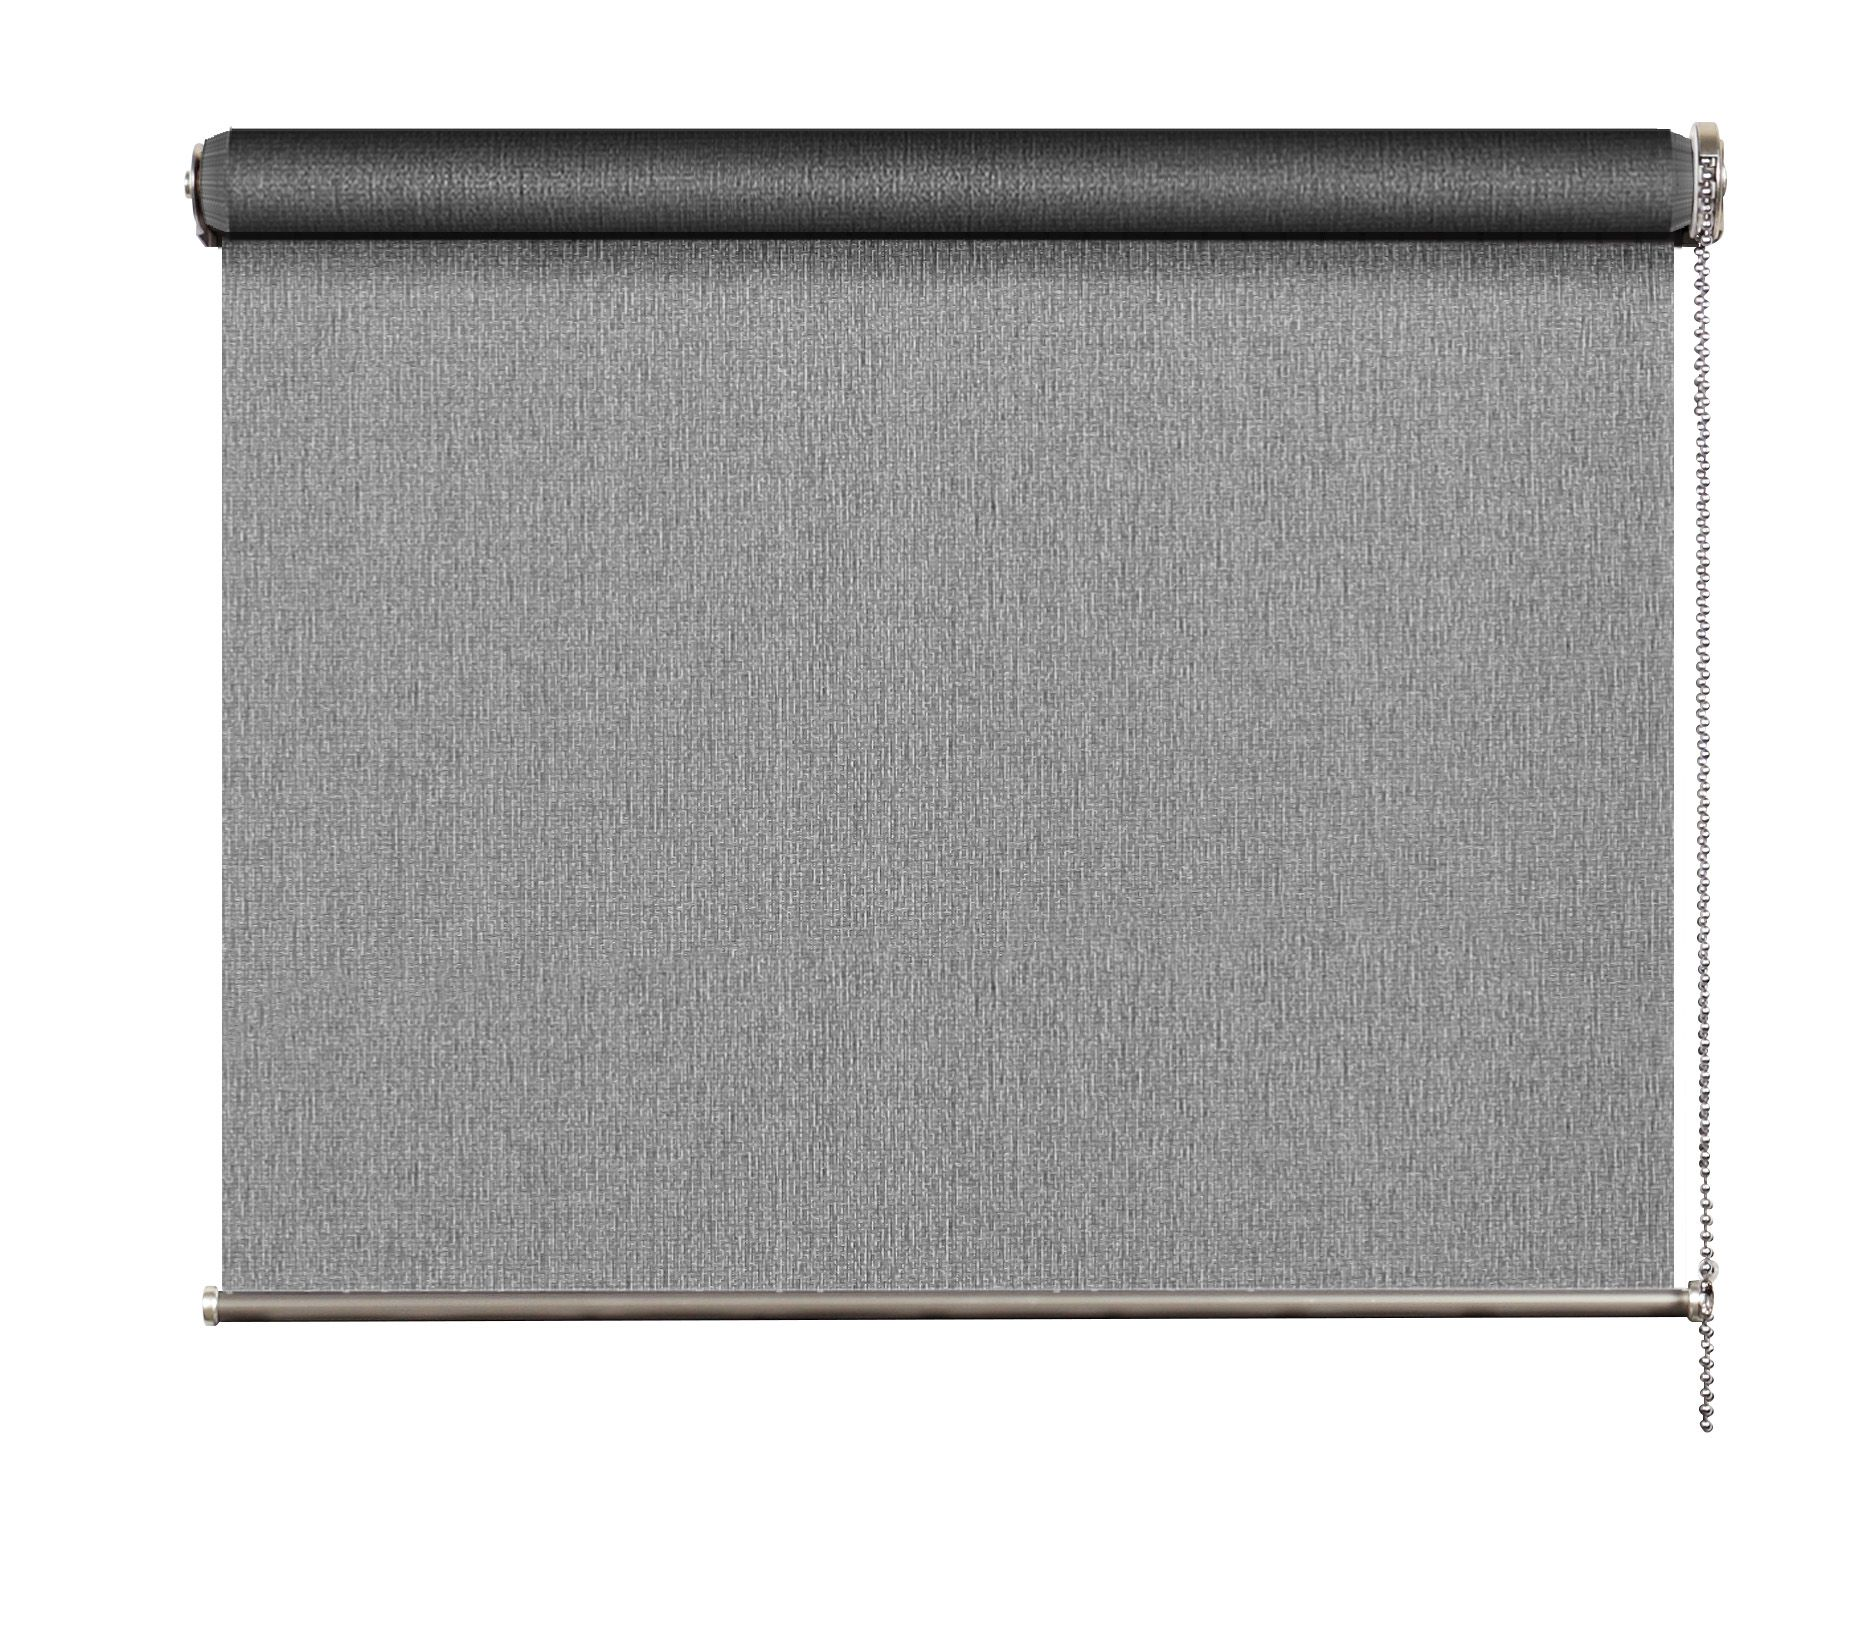 Designrollo Cool Grau, mydeco